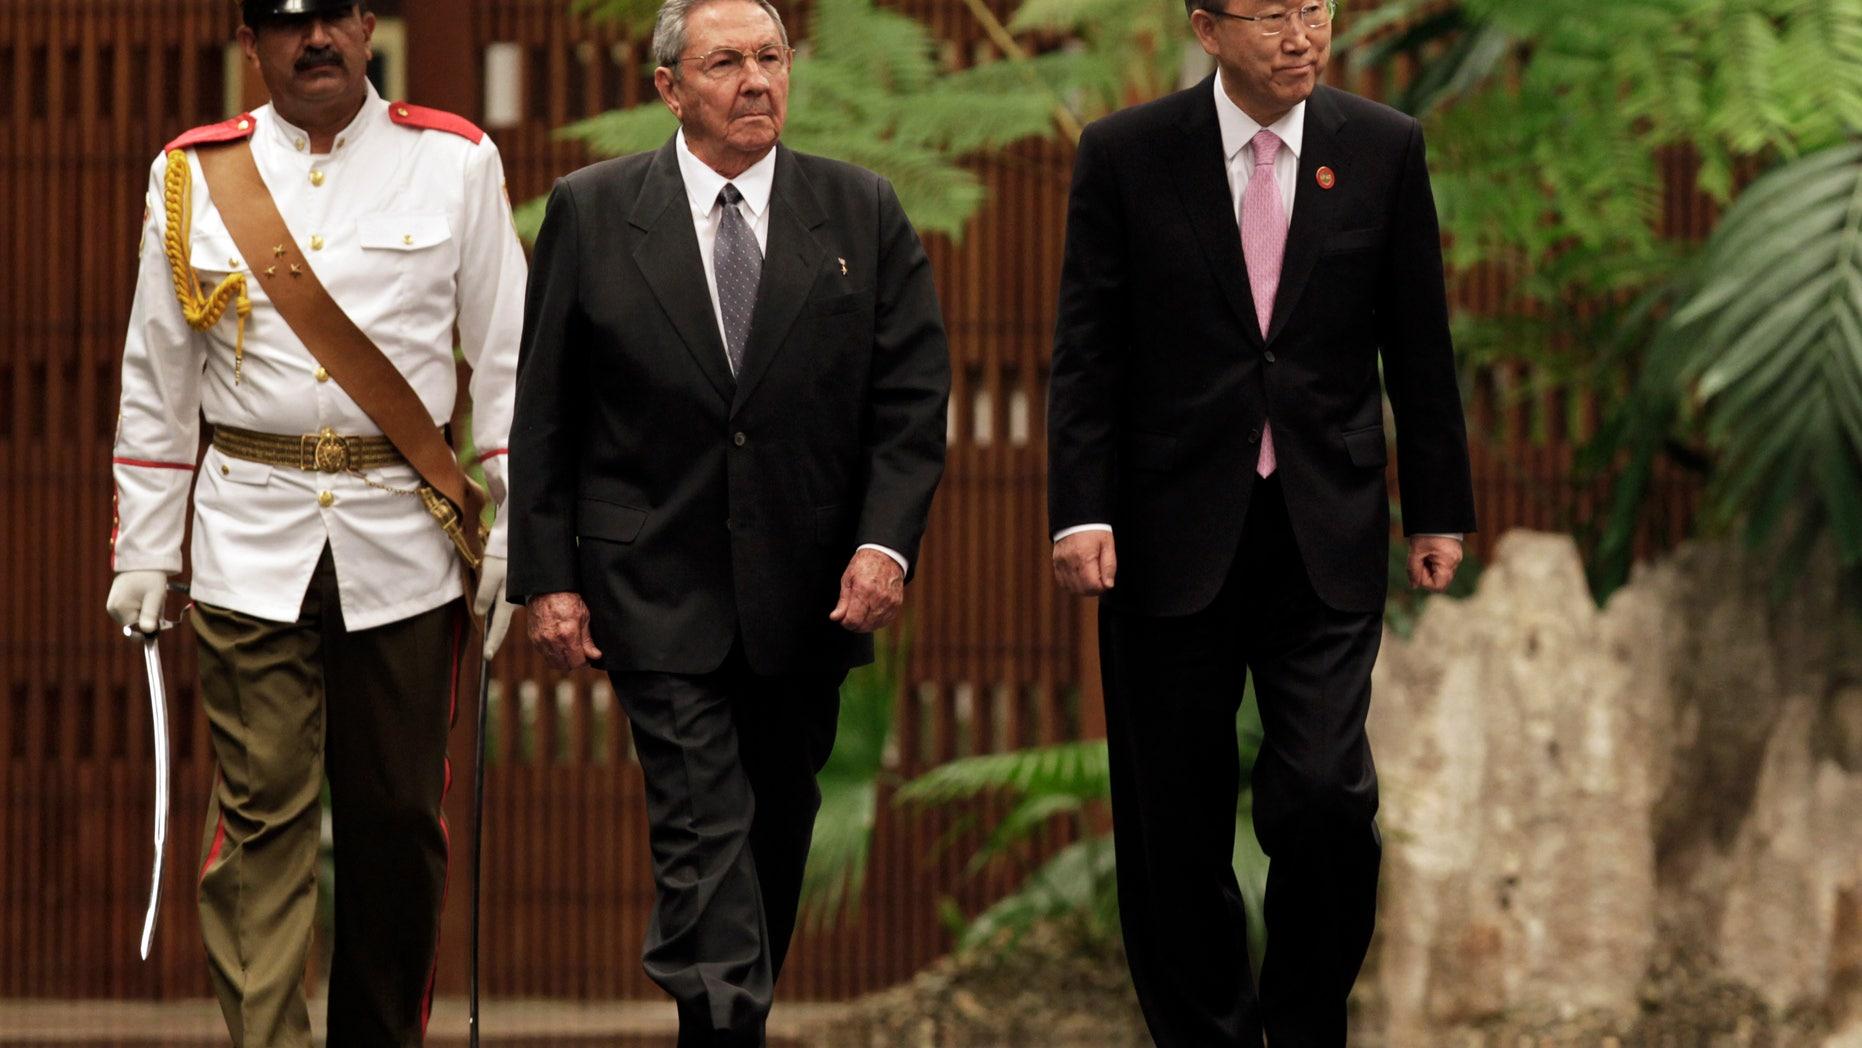 Cuba's President Raul Castro, left center, and U.N. Secretary General Ban Ki-moon, right, review an honor guard at the Revolutionary Palace in Havana, Cuba, Monday, Jan. 27, 2014. (AP Photo/Pool)